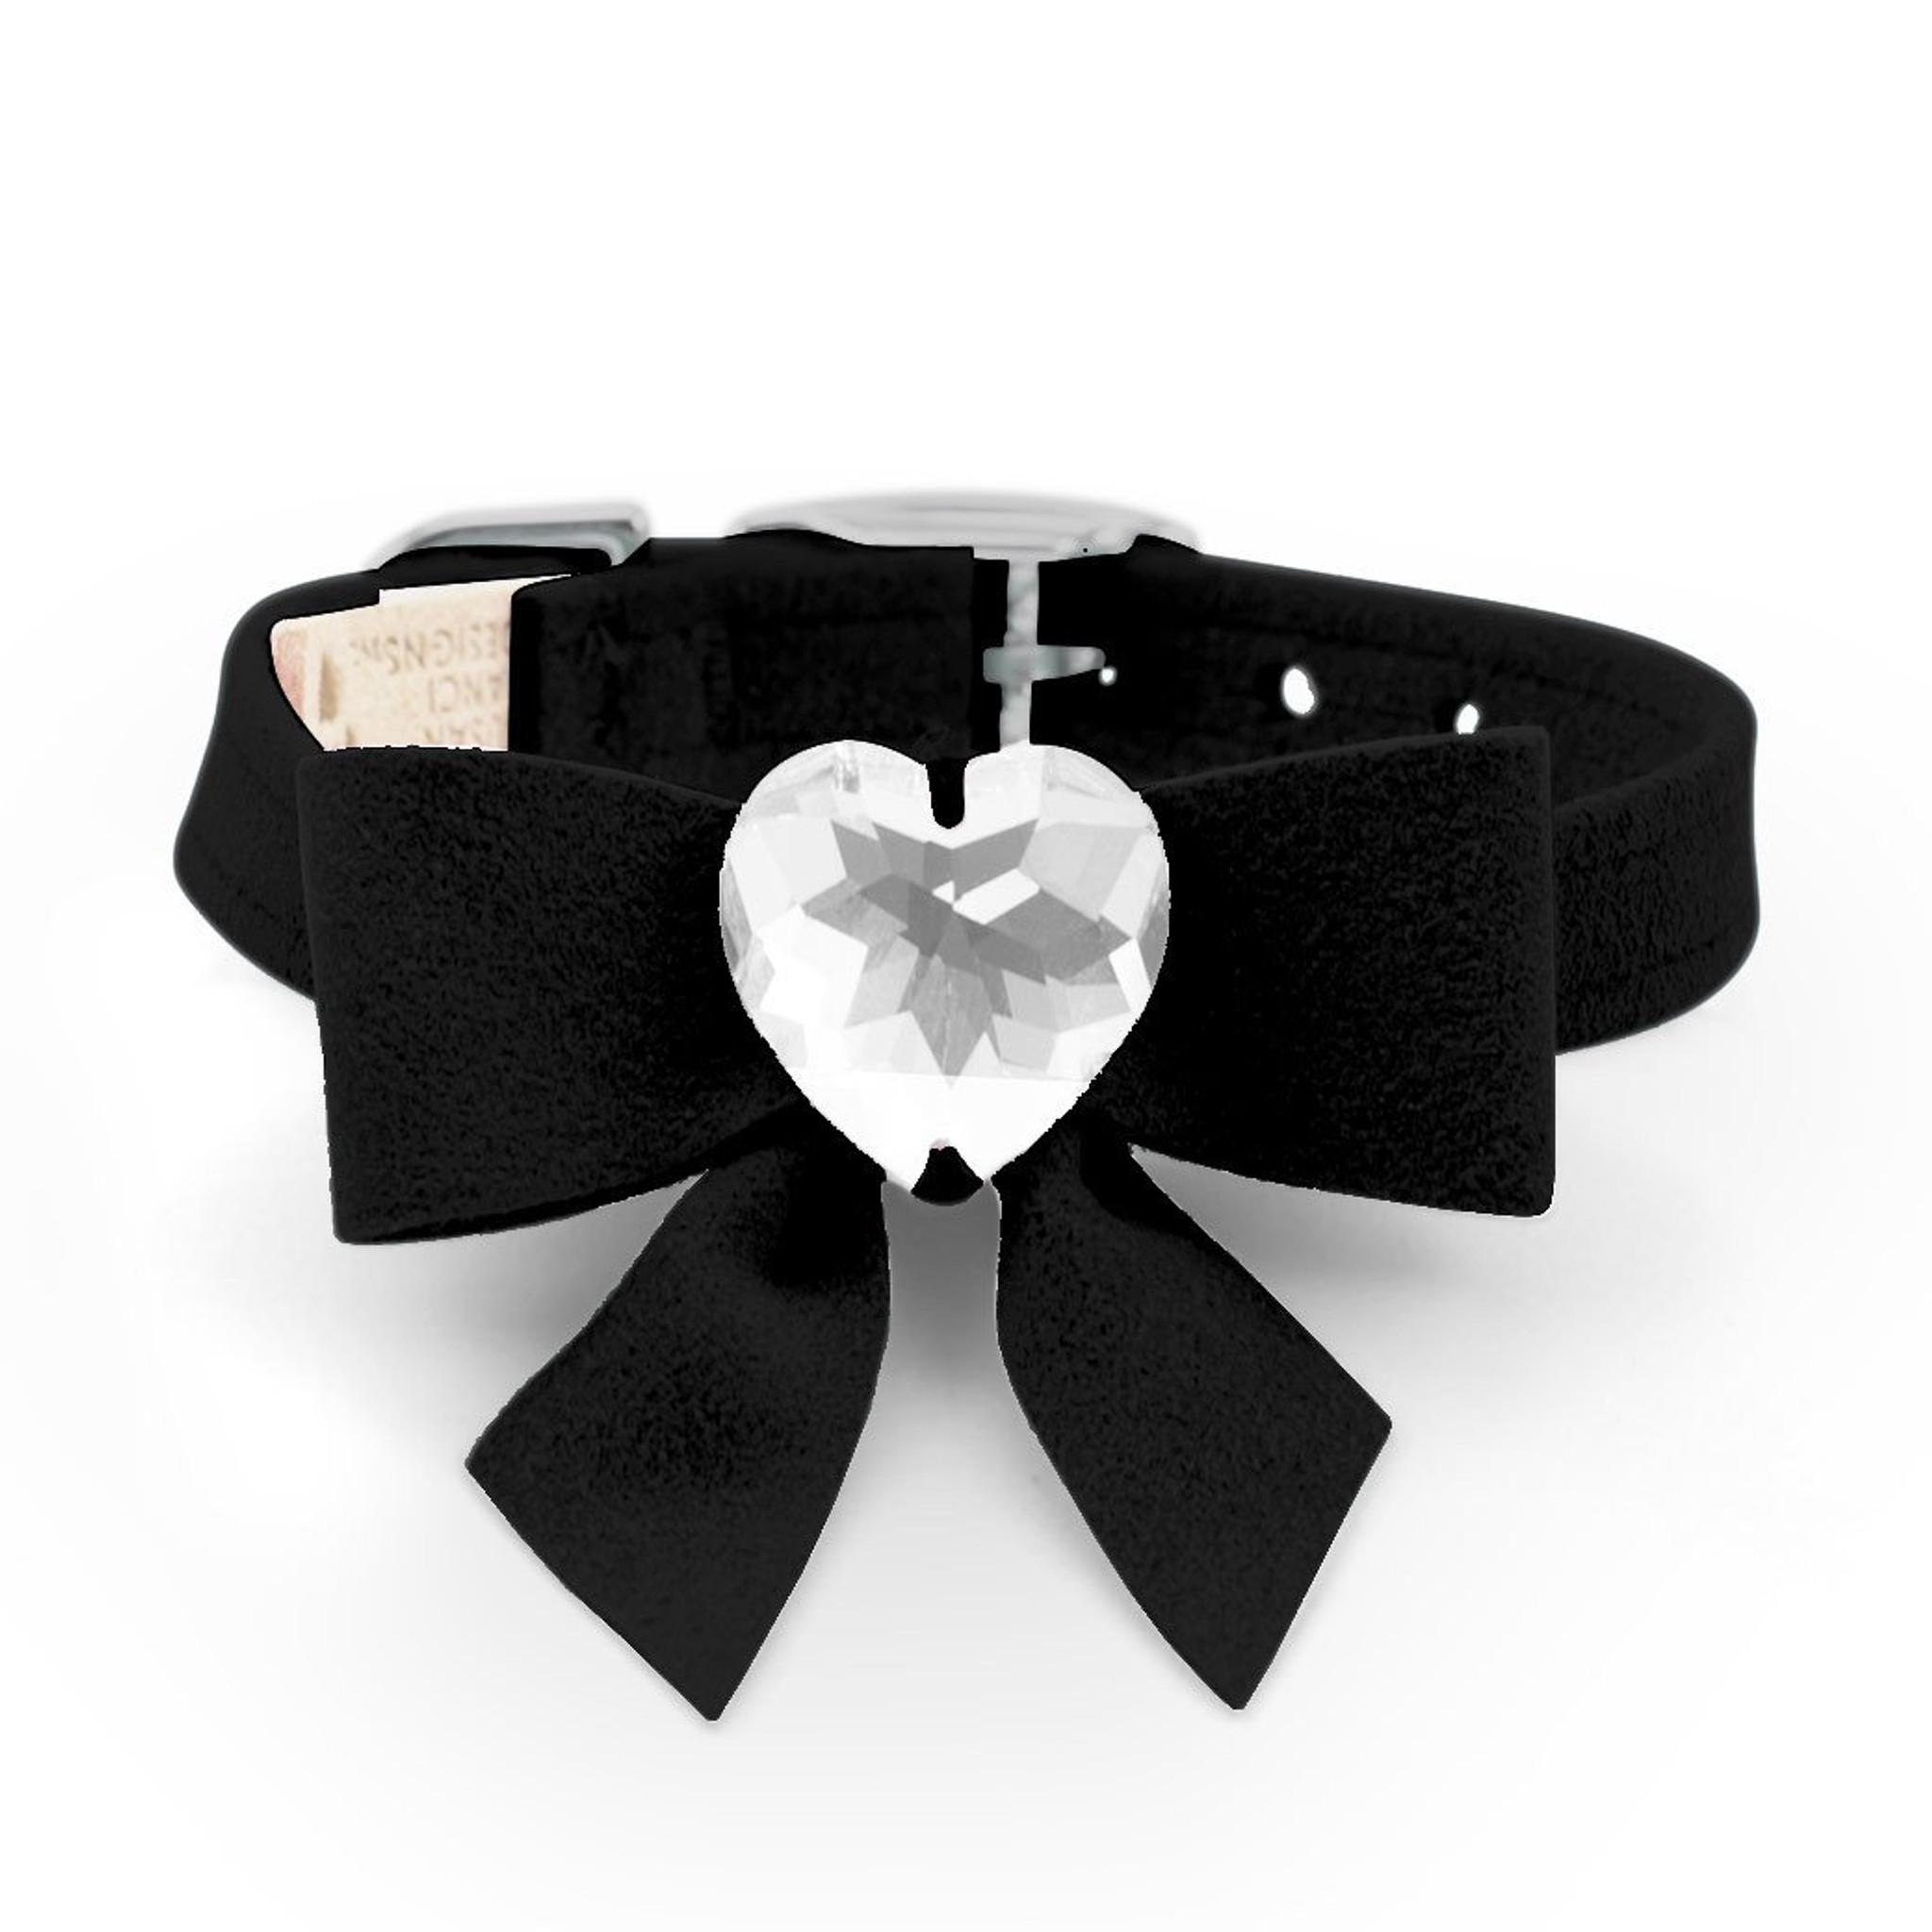 70a3e44d375cc Luna Bowtique Heart Black Bow Collar